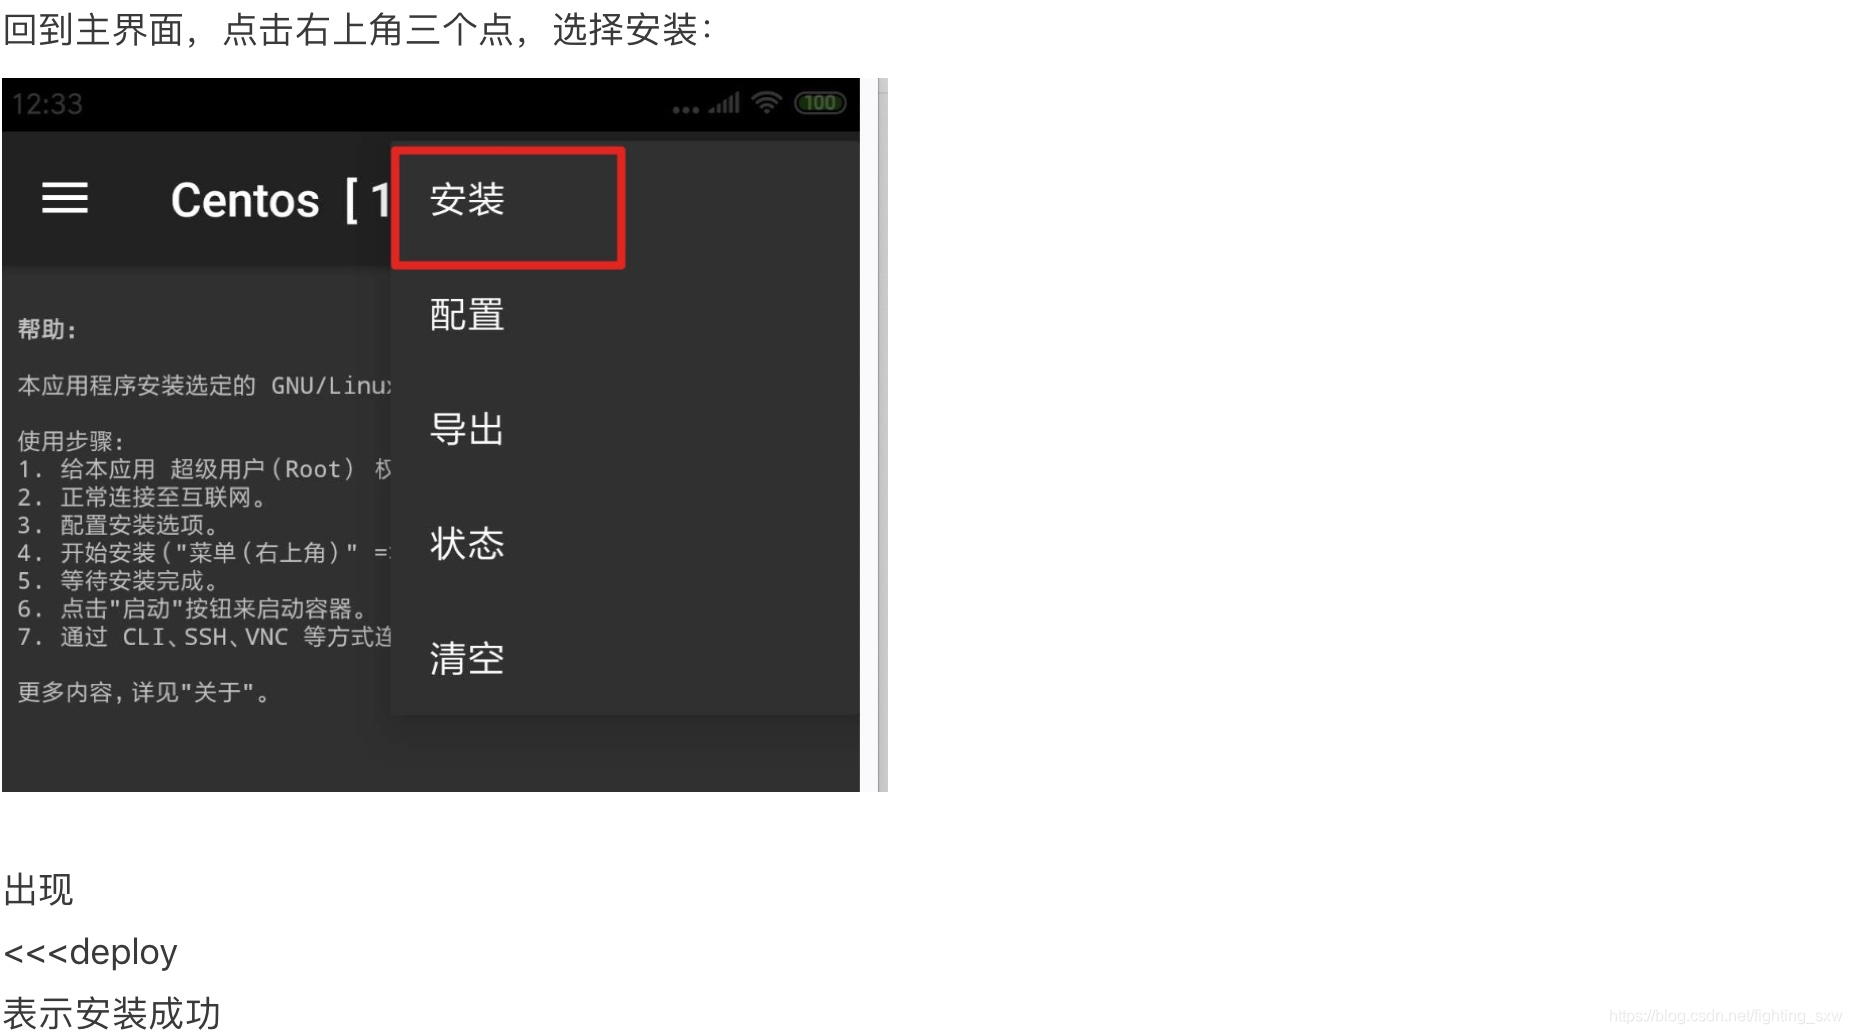 watermark,type ZmFuZ3poZW5naGVpdGk,shadow 10,text aHR0cHM6Ly9ibG9nLmNzZG4ubmV0L2ZpZ2h0aW5nX3N4dw==,size 16,color FFFFFF,t 70 - 安卓Linux Deploy